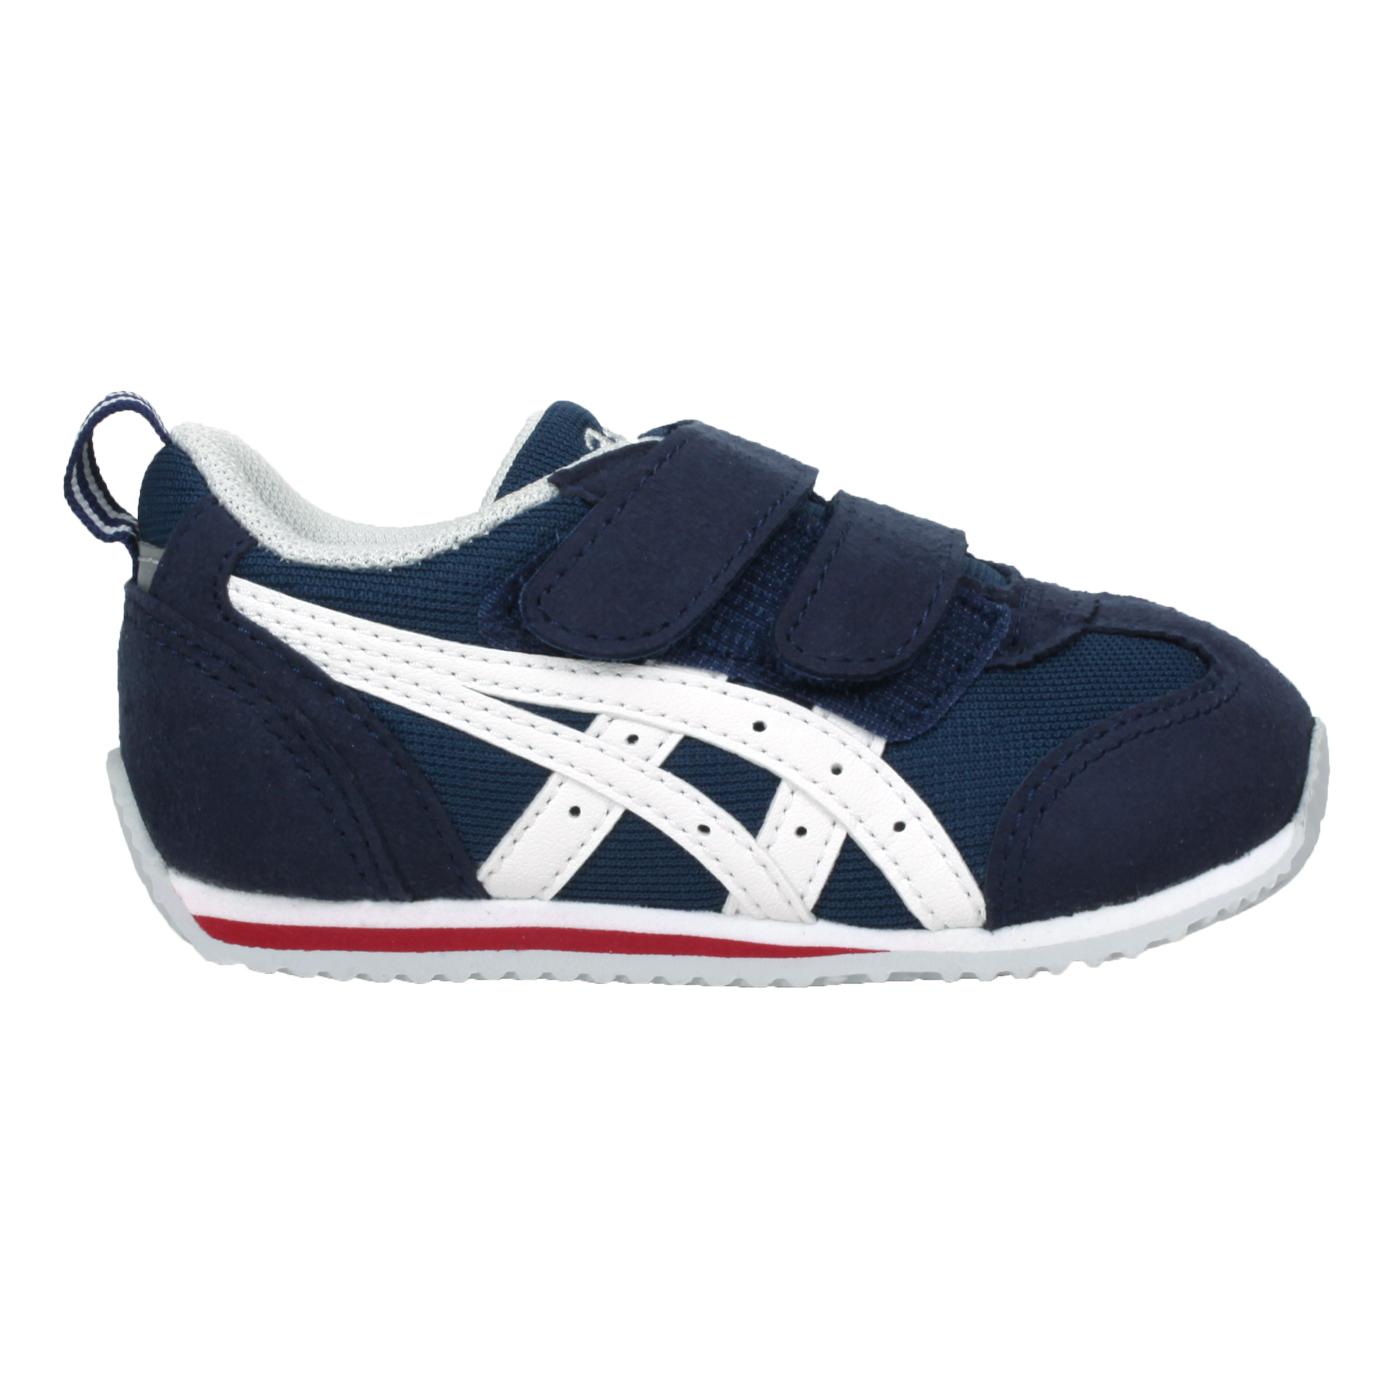 ASICS 小童運動鞋  @IDAHO BABY JP@TUB164-5001 - 深藍白紅